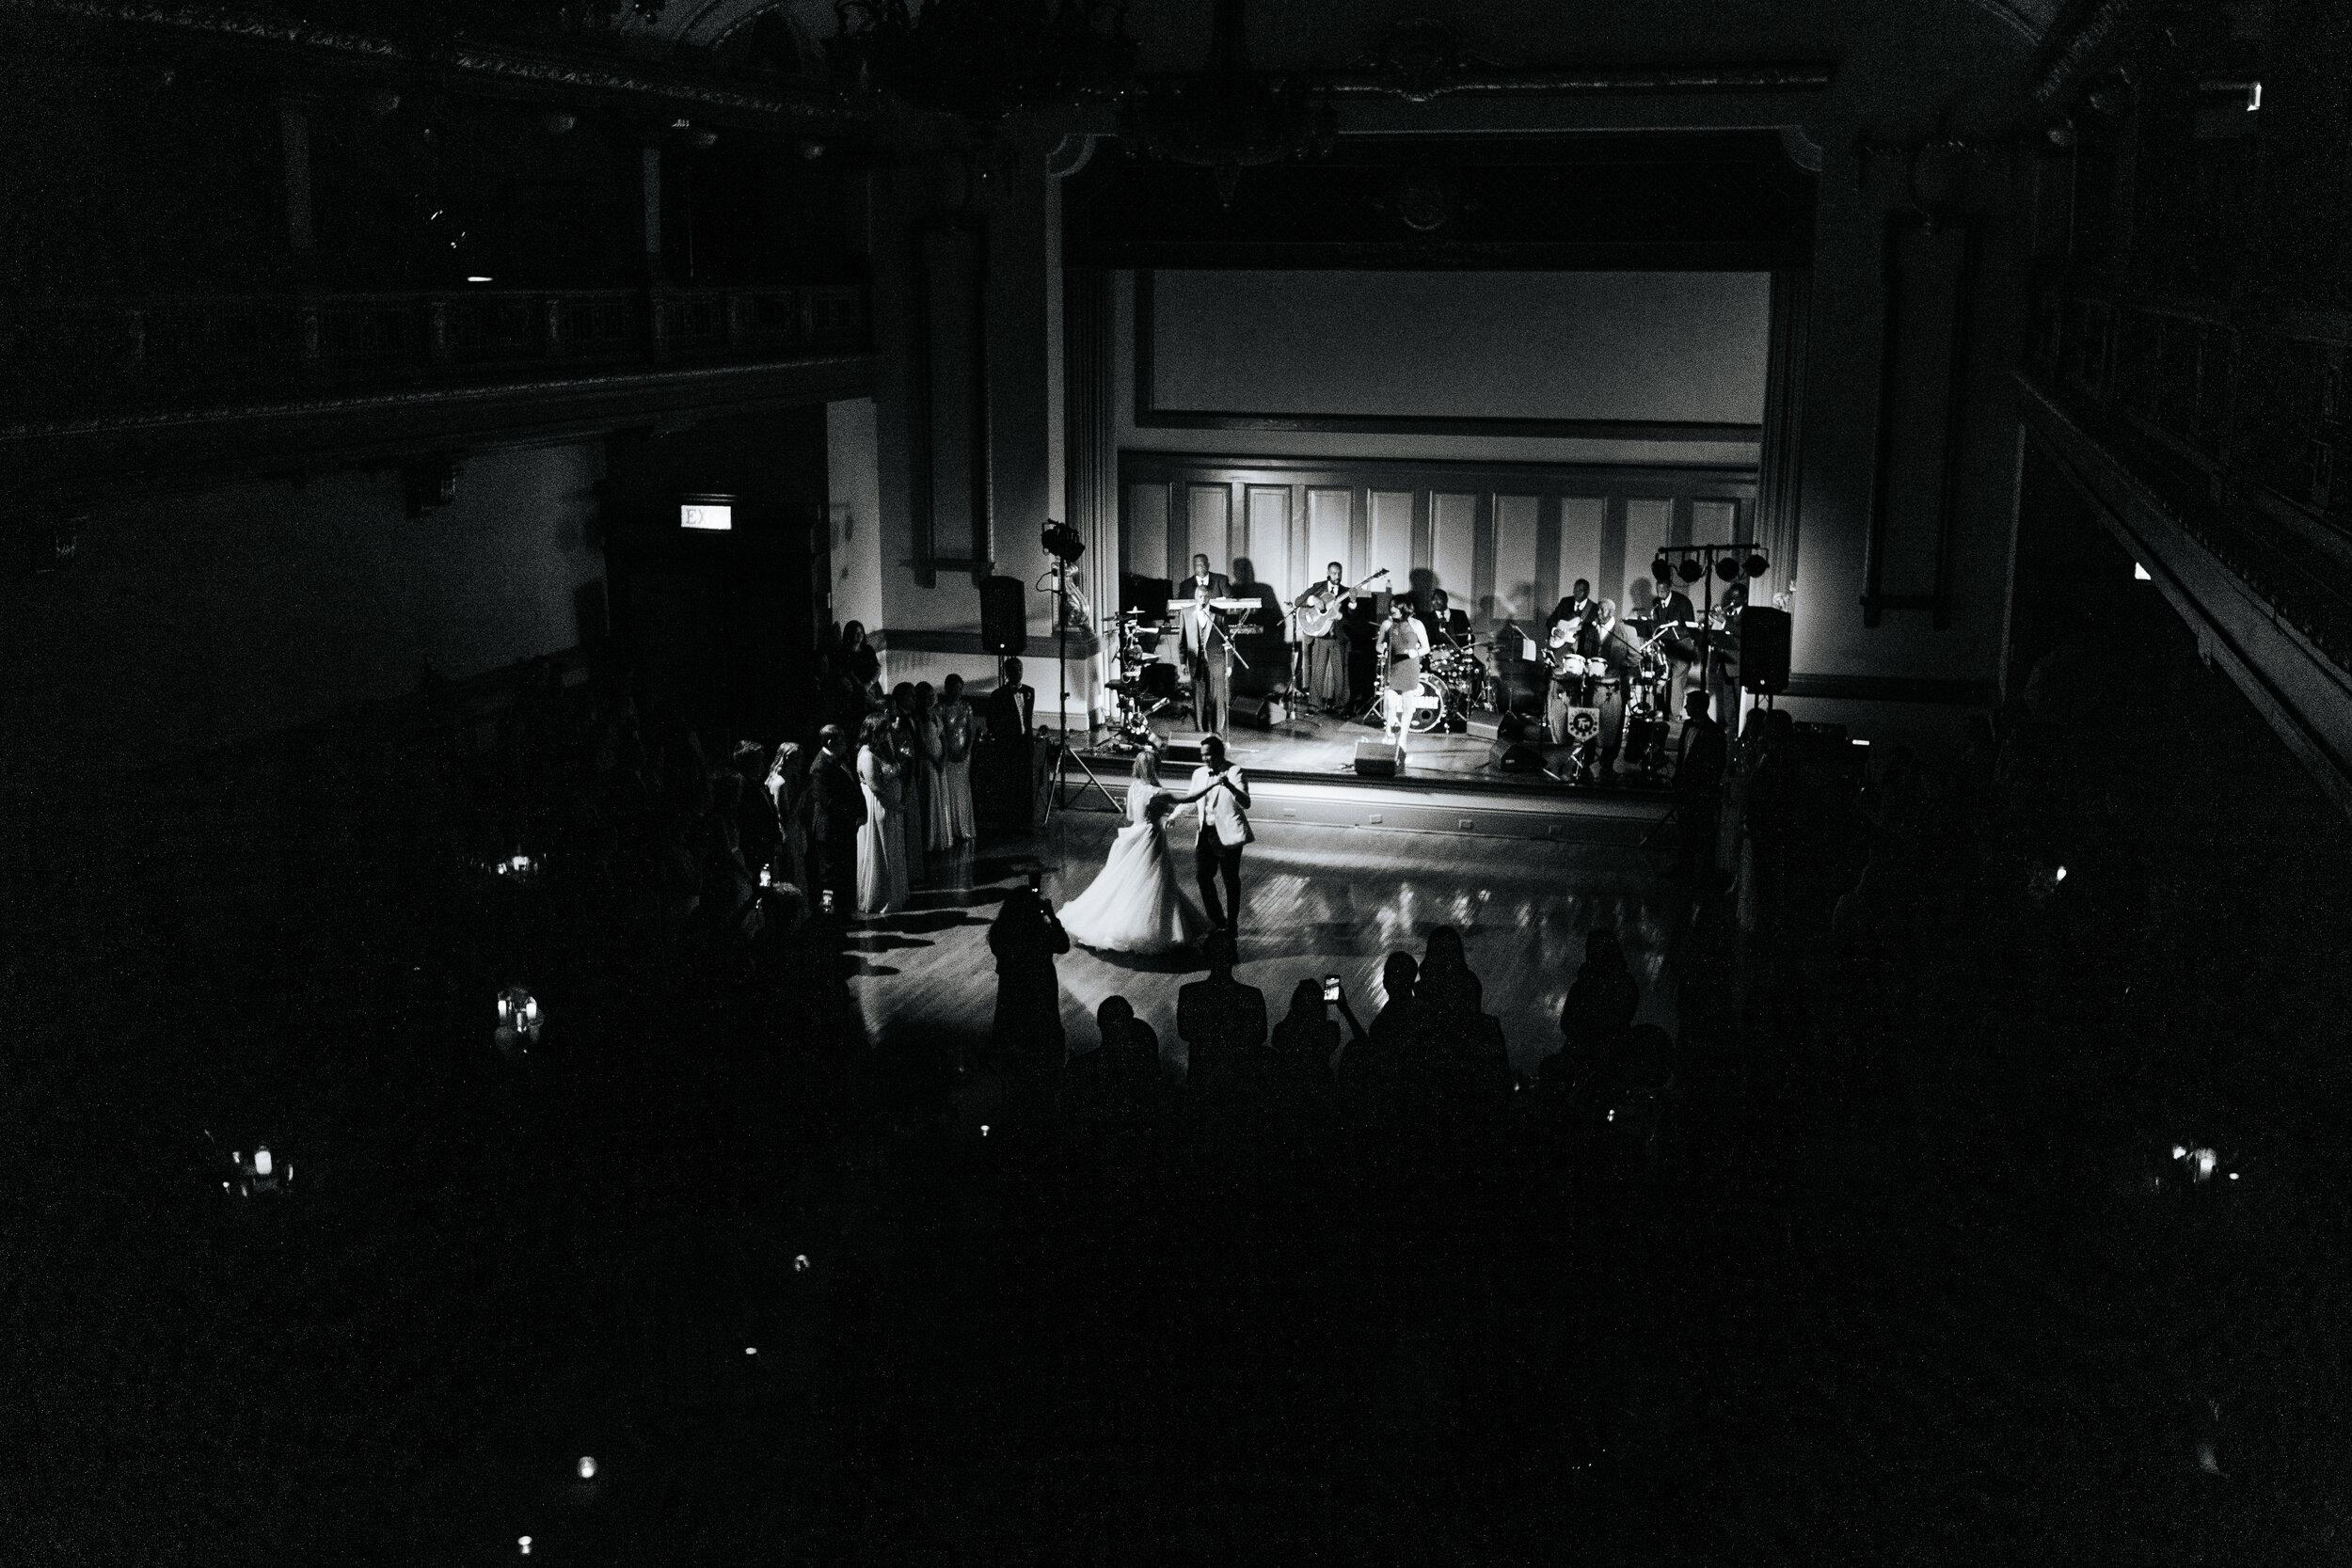 Cassie-Mrunal-Wedding-Quirk-Hotel-John-Marshall-Ballrooms-Richmond-Virginia-Photography-by-V-92.jpg